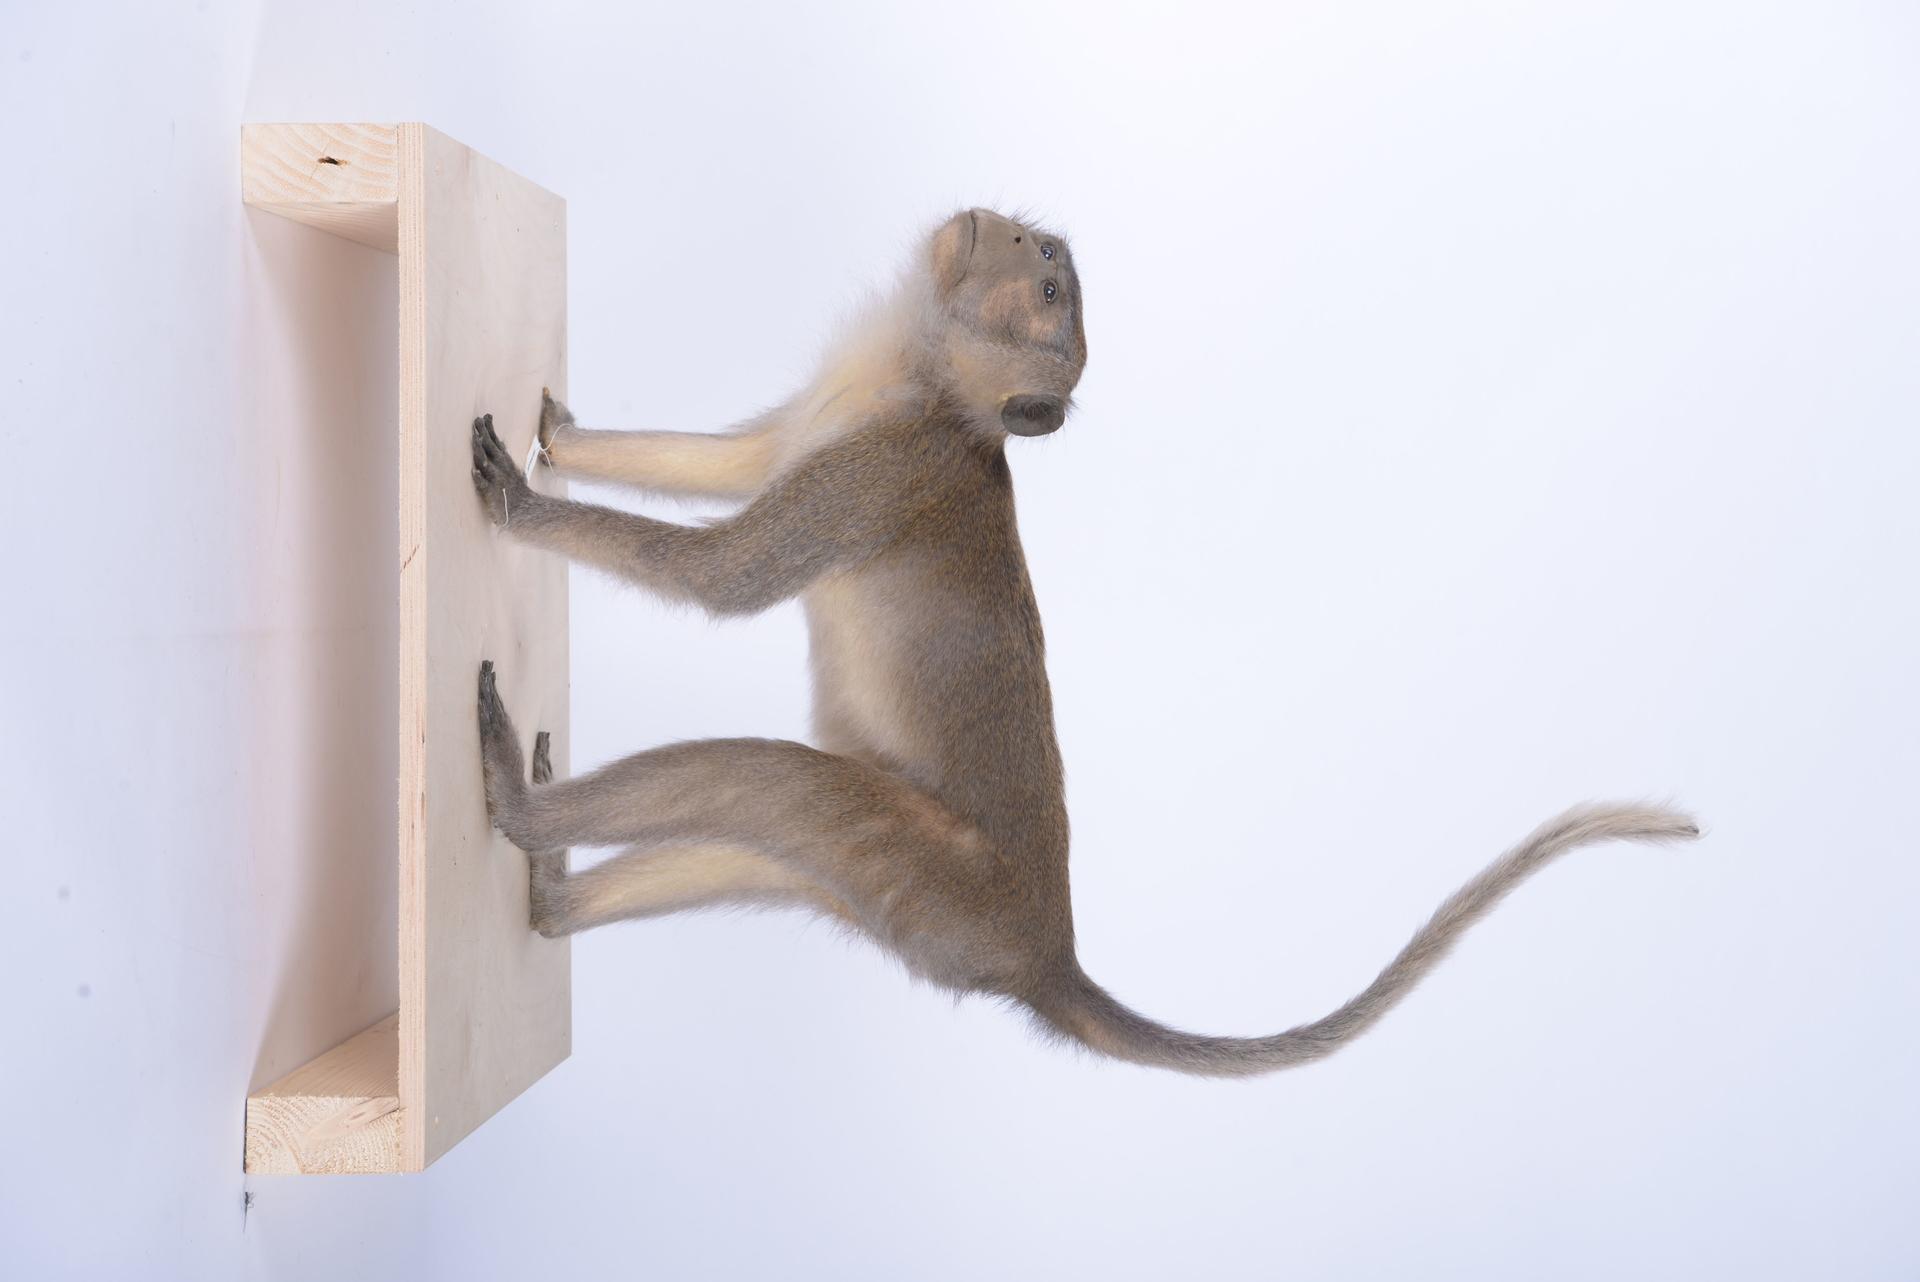 RMNH.MAM.60089   Macaca fascicularis Raffles, 1821